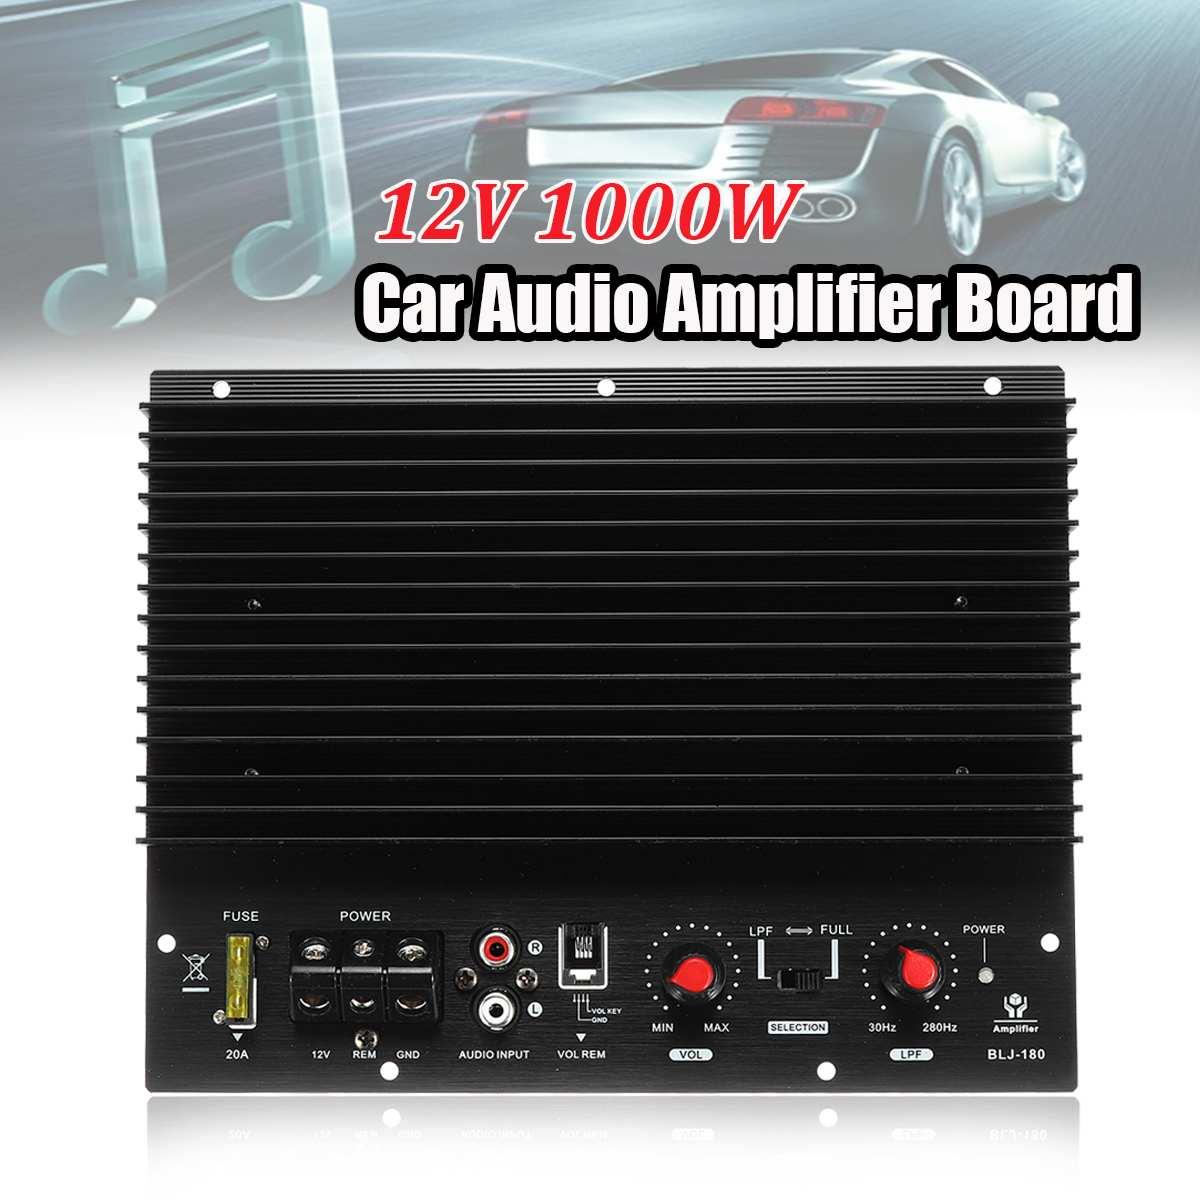 12V 1000W Car Sound Amplifier Subwoofer Amplifier Board High Power Powerful Bass Car Player amplificador|Mono Amplifiers| |  - title=